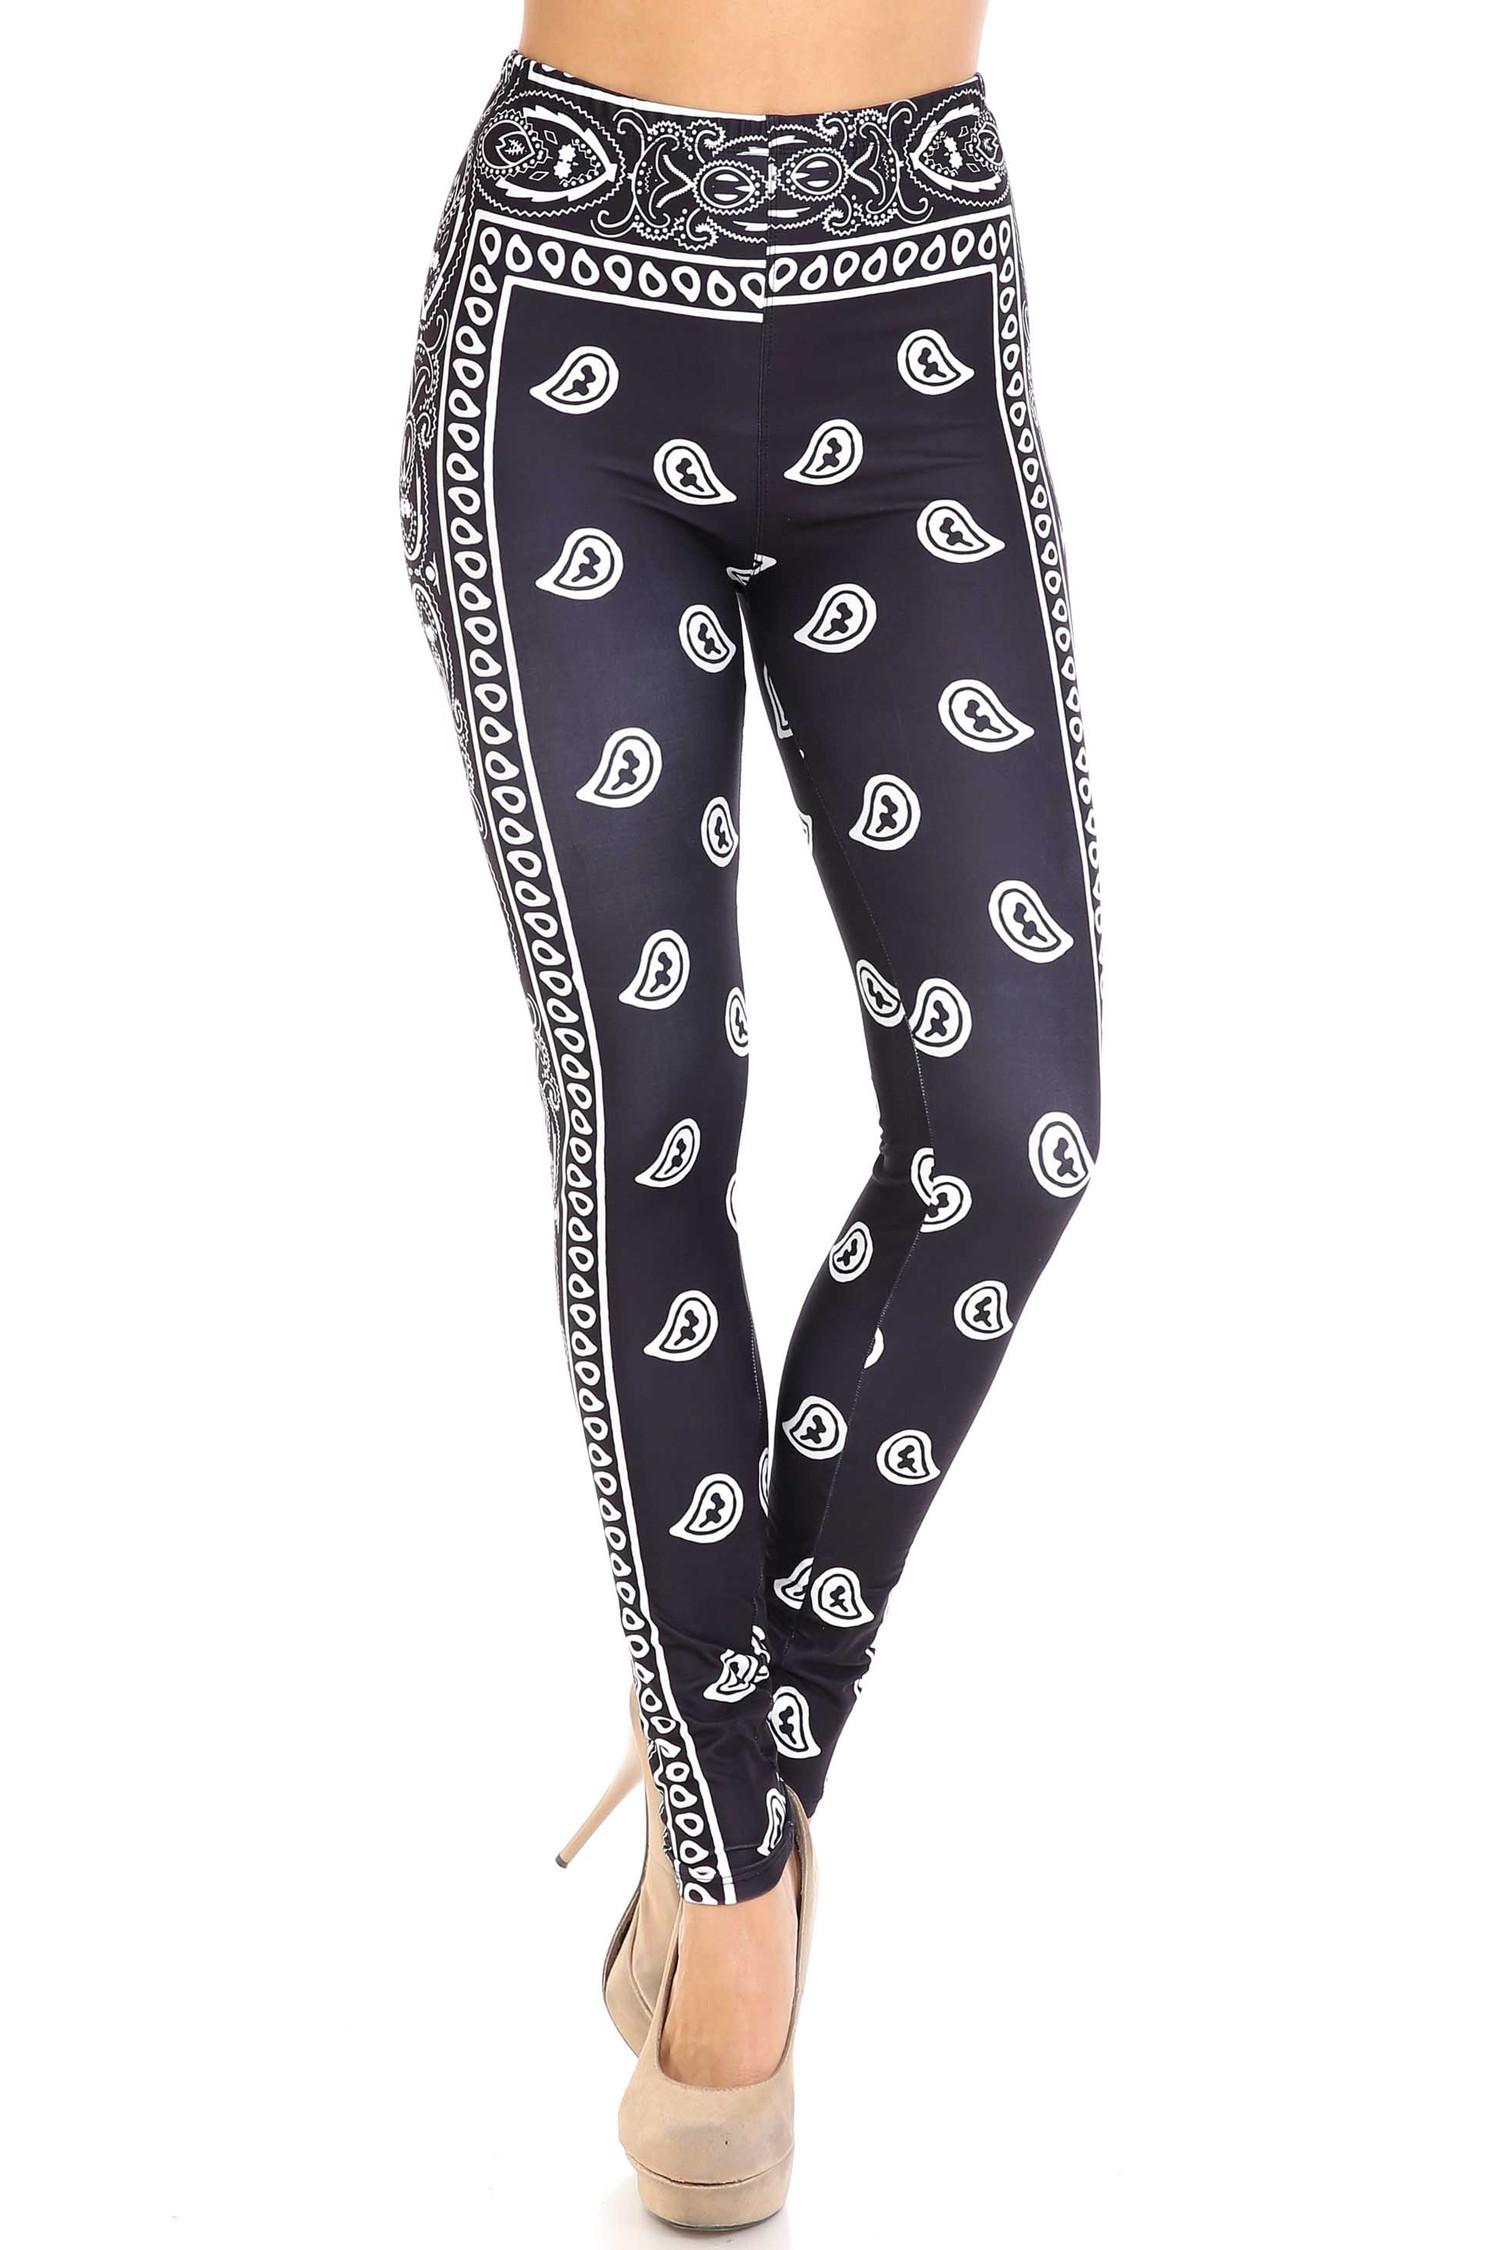 Creamy Soft Black Bandana Leggings - USA Fashion™